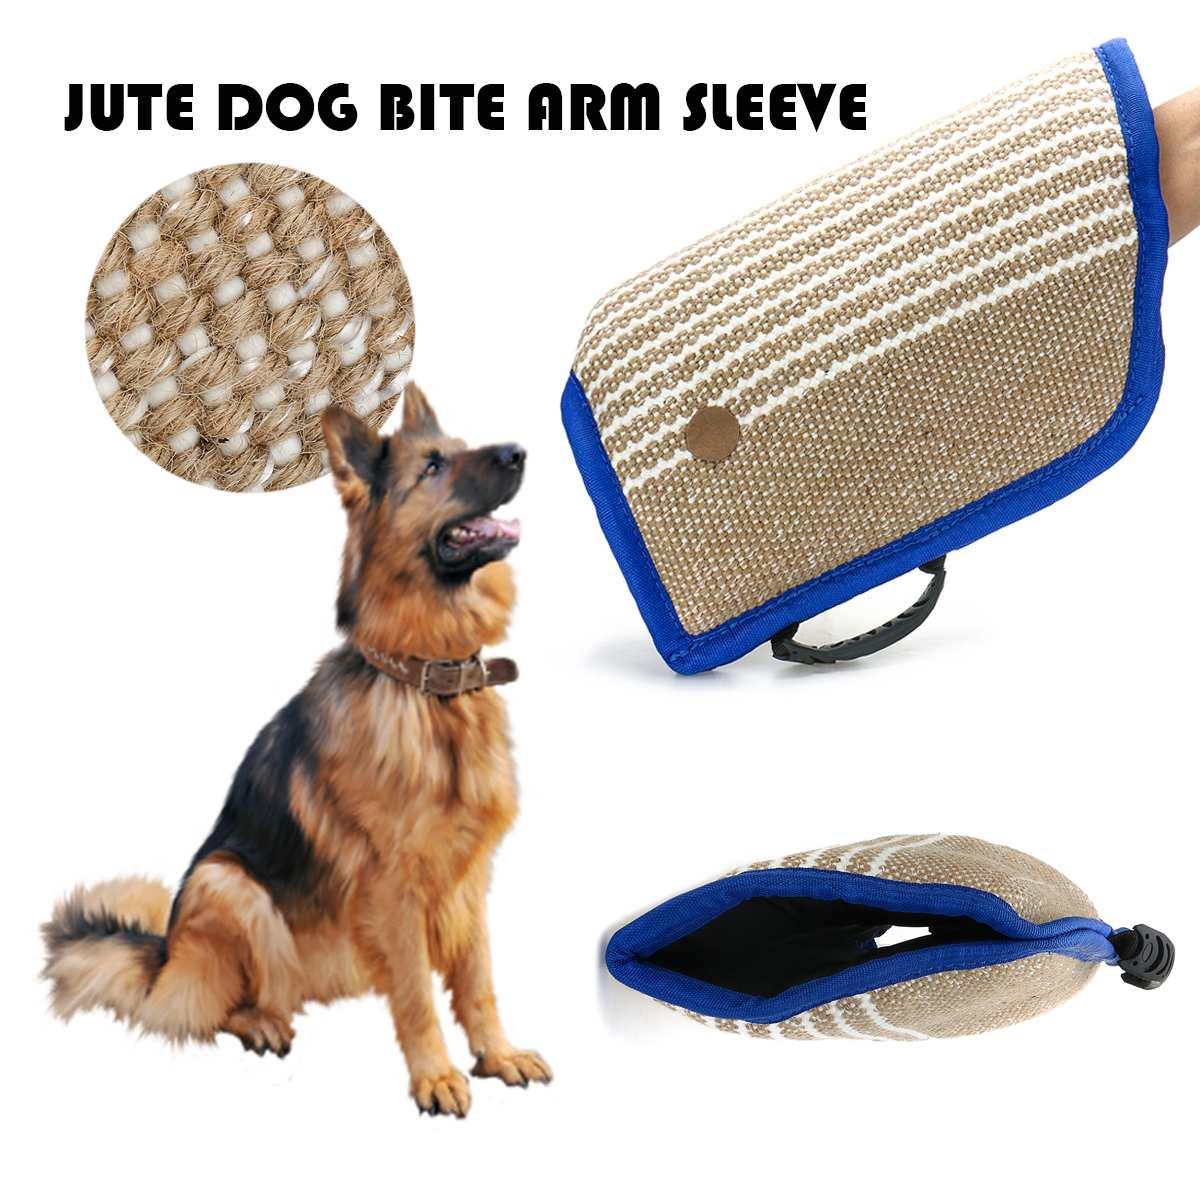 Dog Bite Arm Sleeve Shepherd Training Shepherd Suppiles Tool